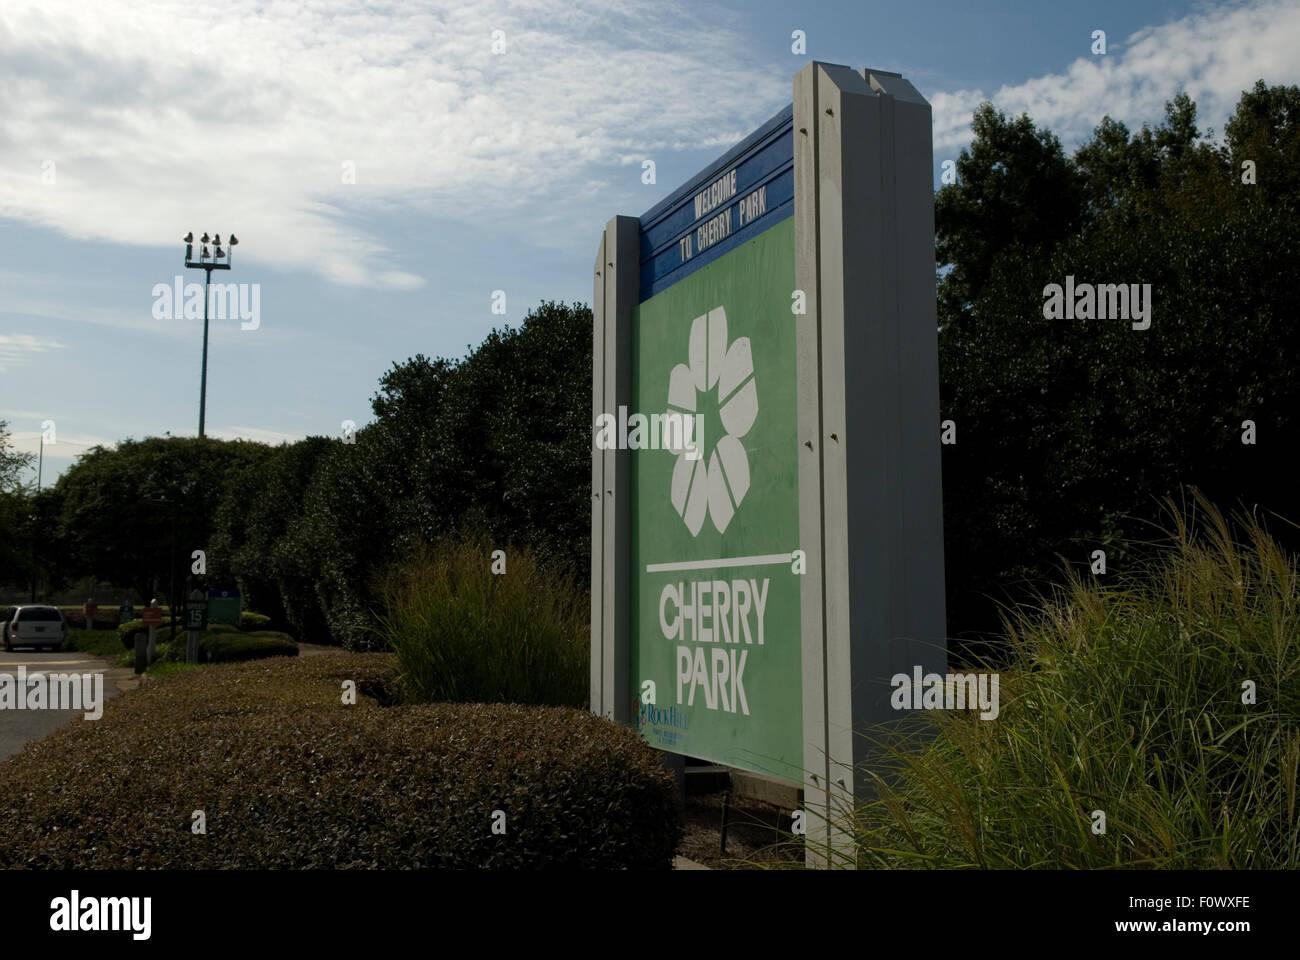 Cherry Park Rock Hill South Carolina USA - Stock Image